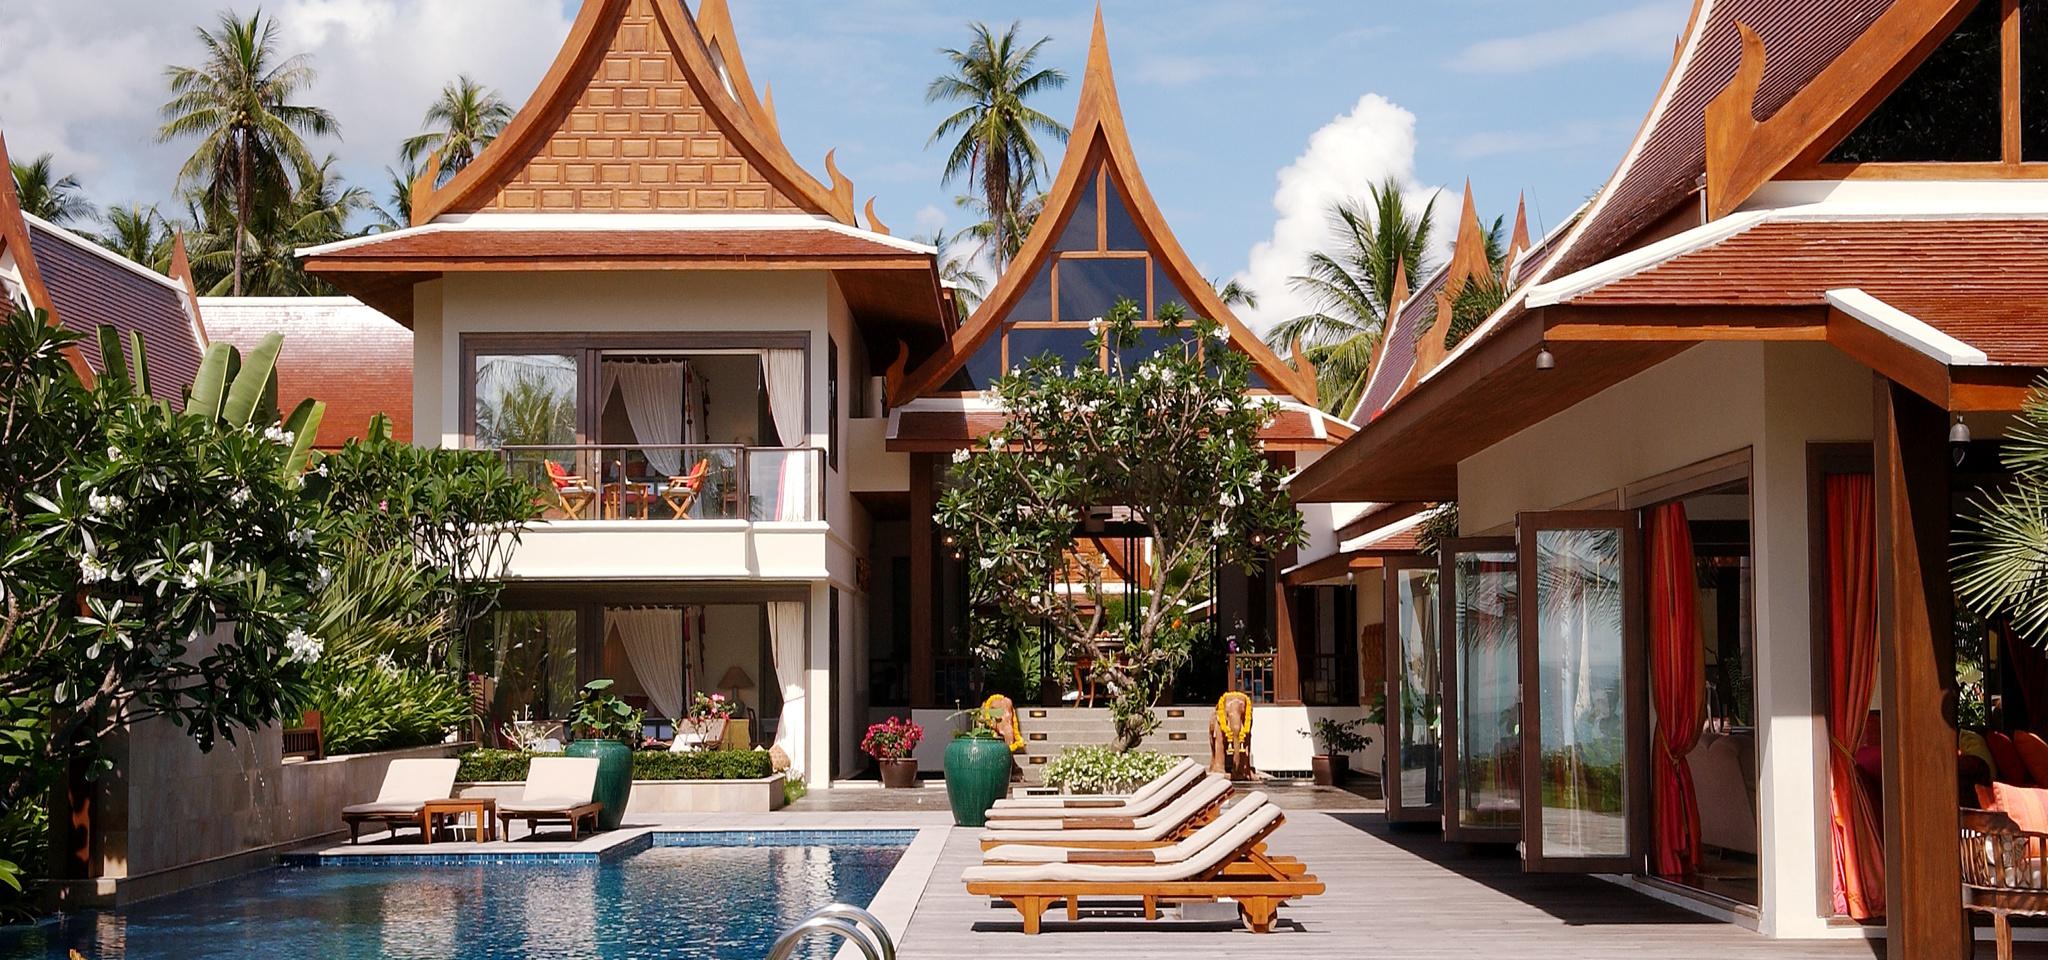 traditional luxury villa in thailand